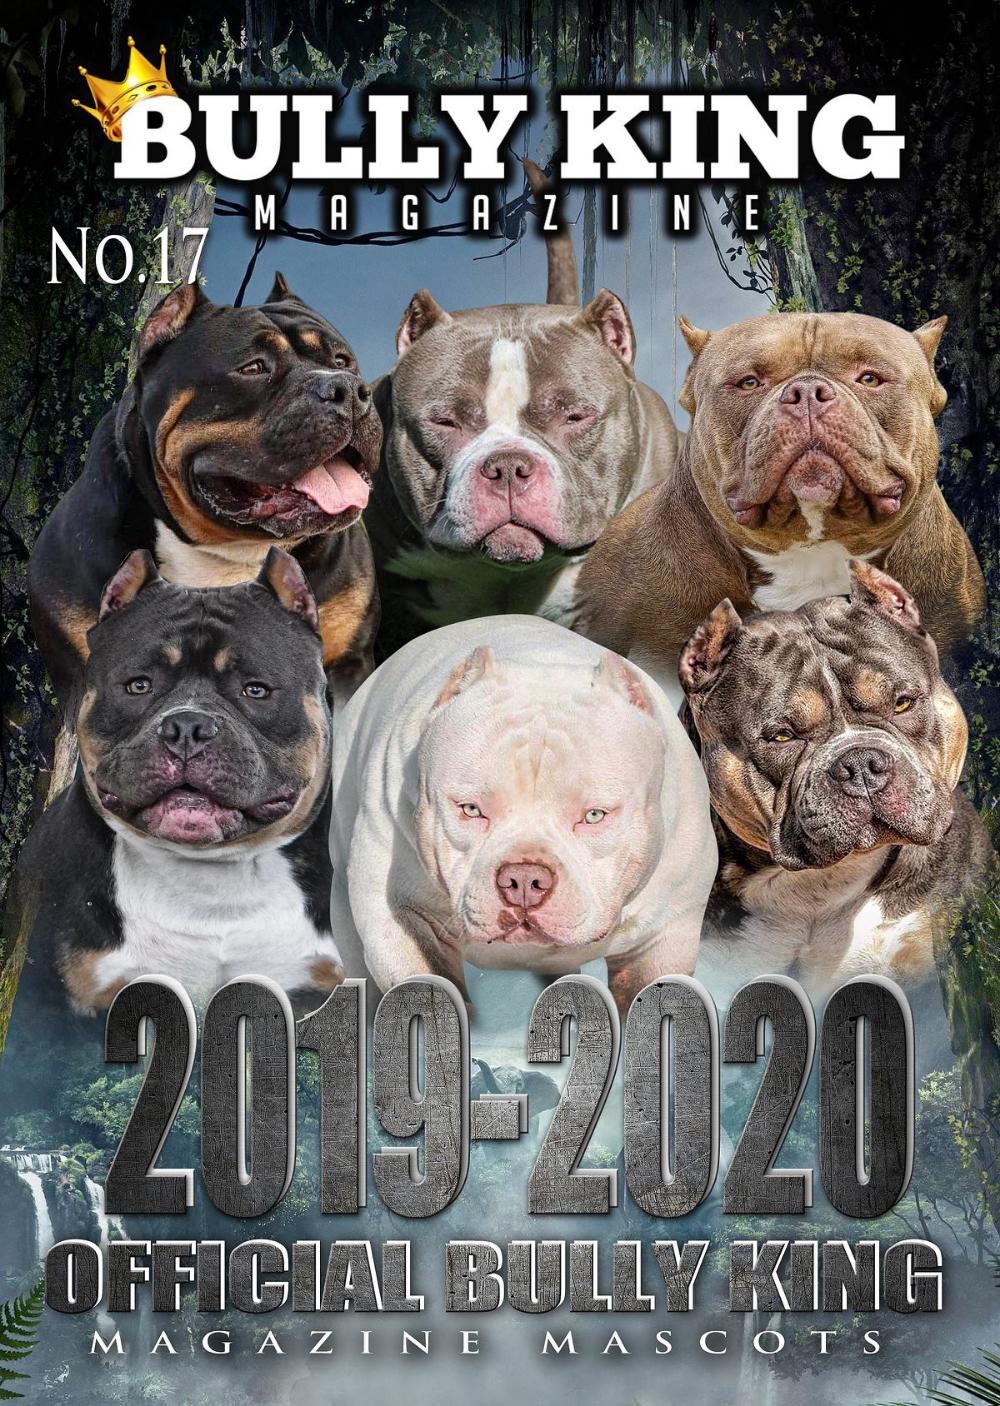 Introducing The 2019 2020 Bully King Magazine Mascots American Bully Bully Breeds The Little Polar Bear